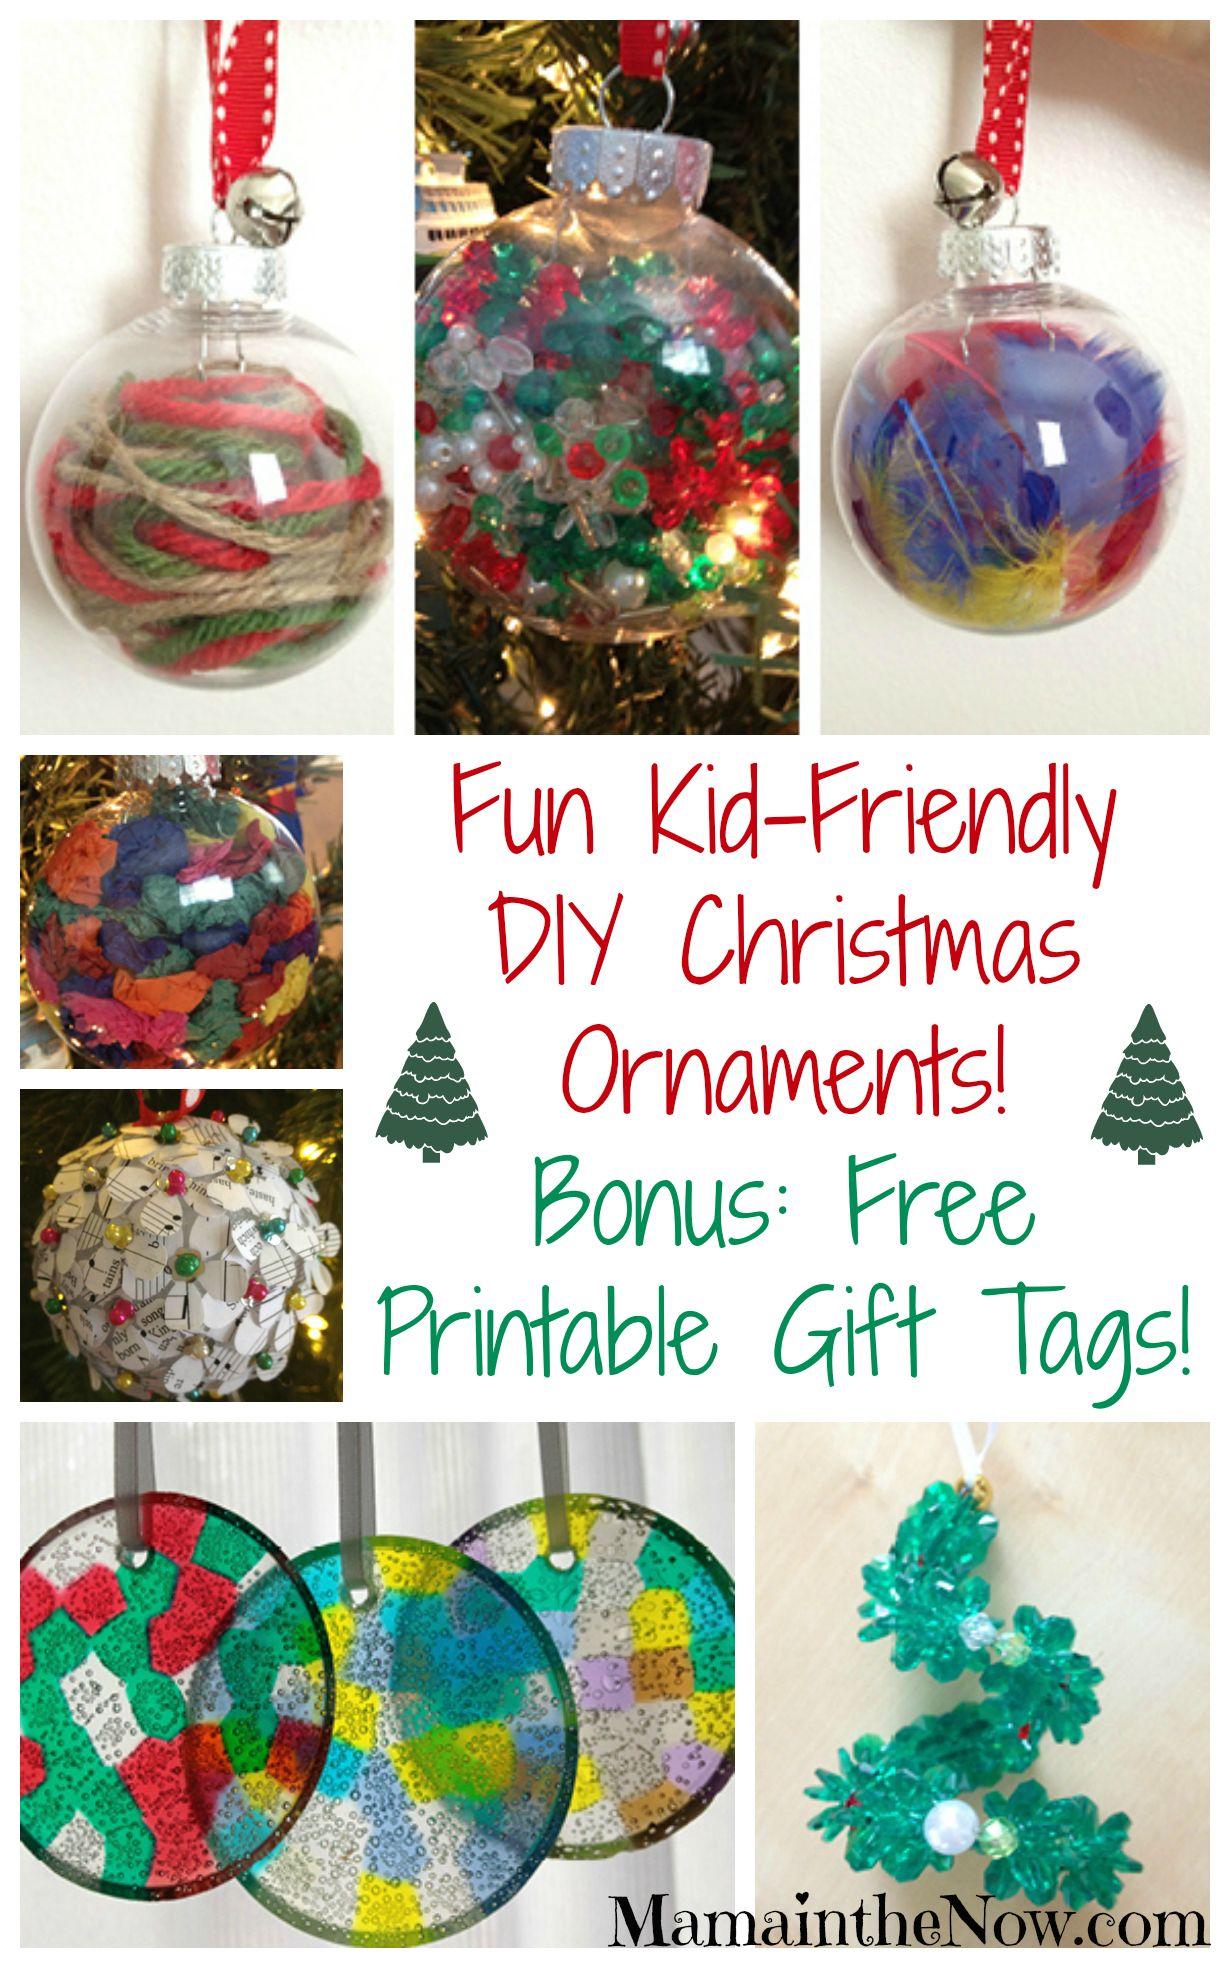 Easy KidFriendly DIY Christmas Ornaments! Diy christmas